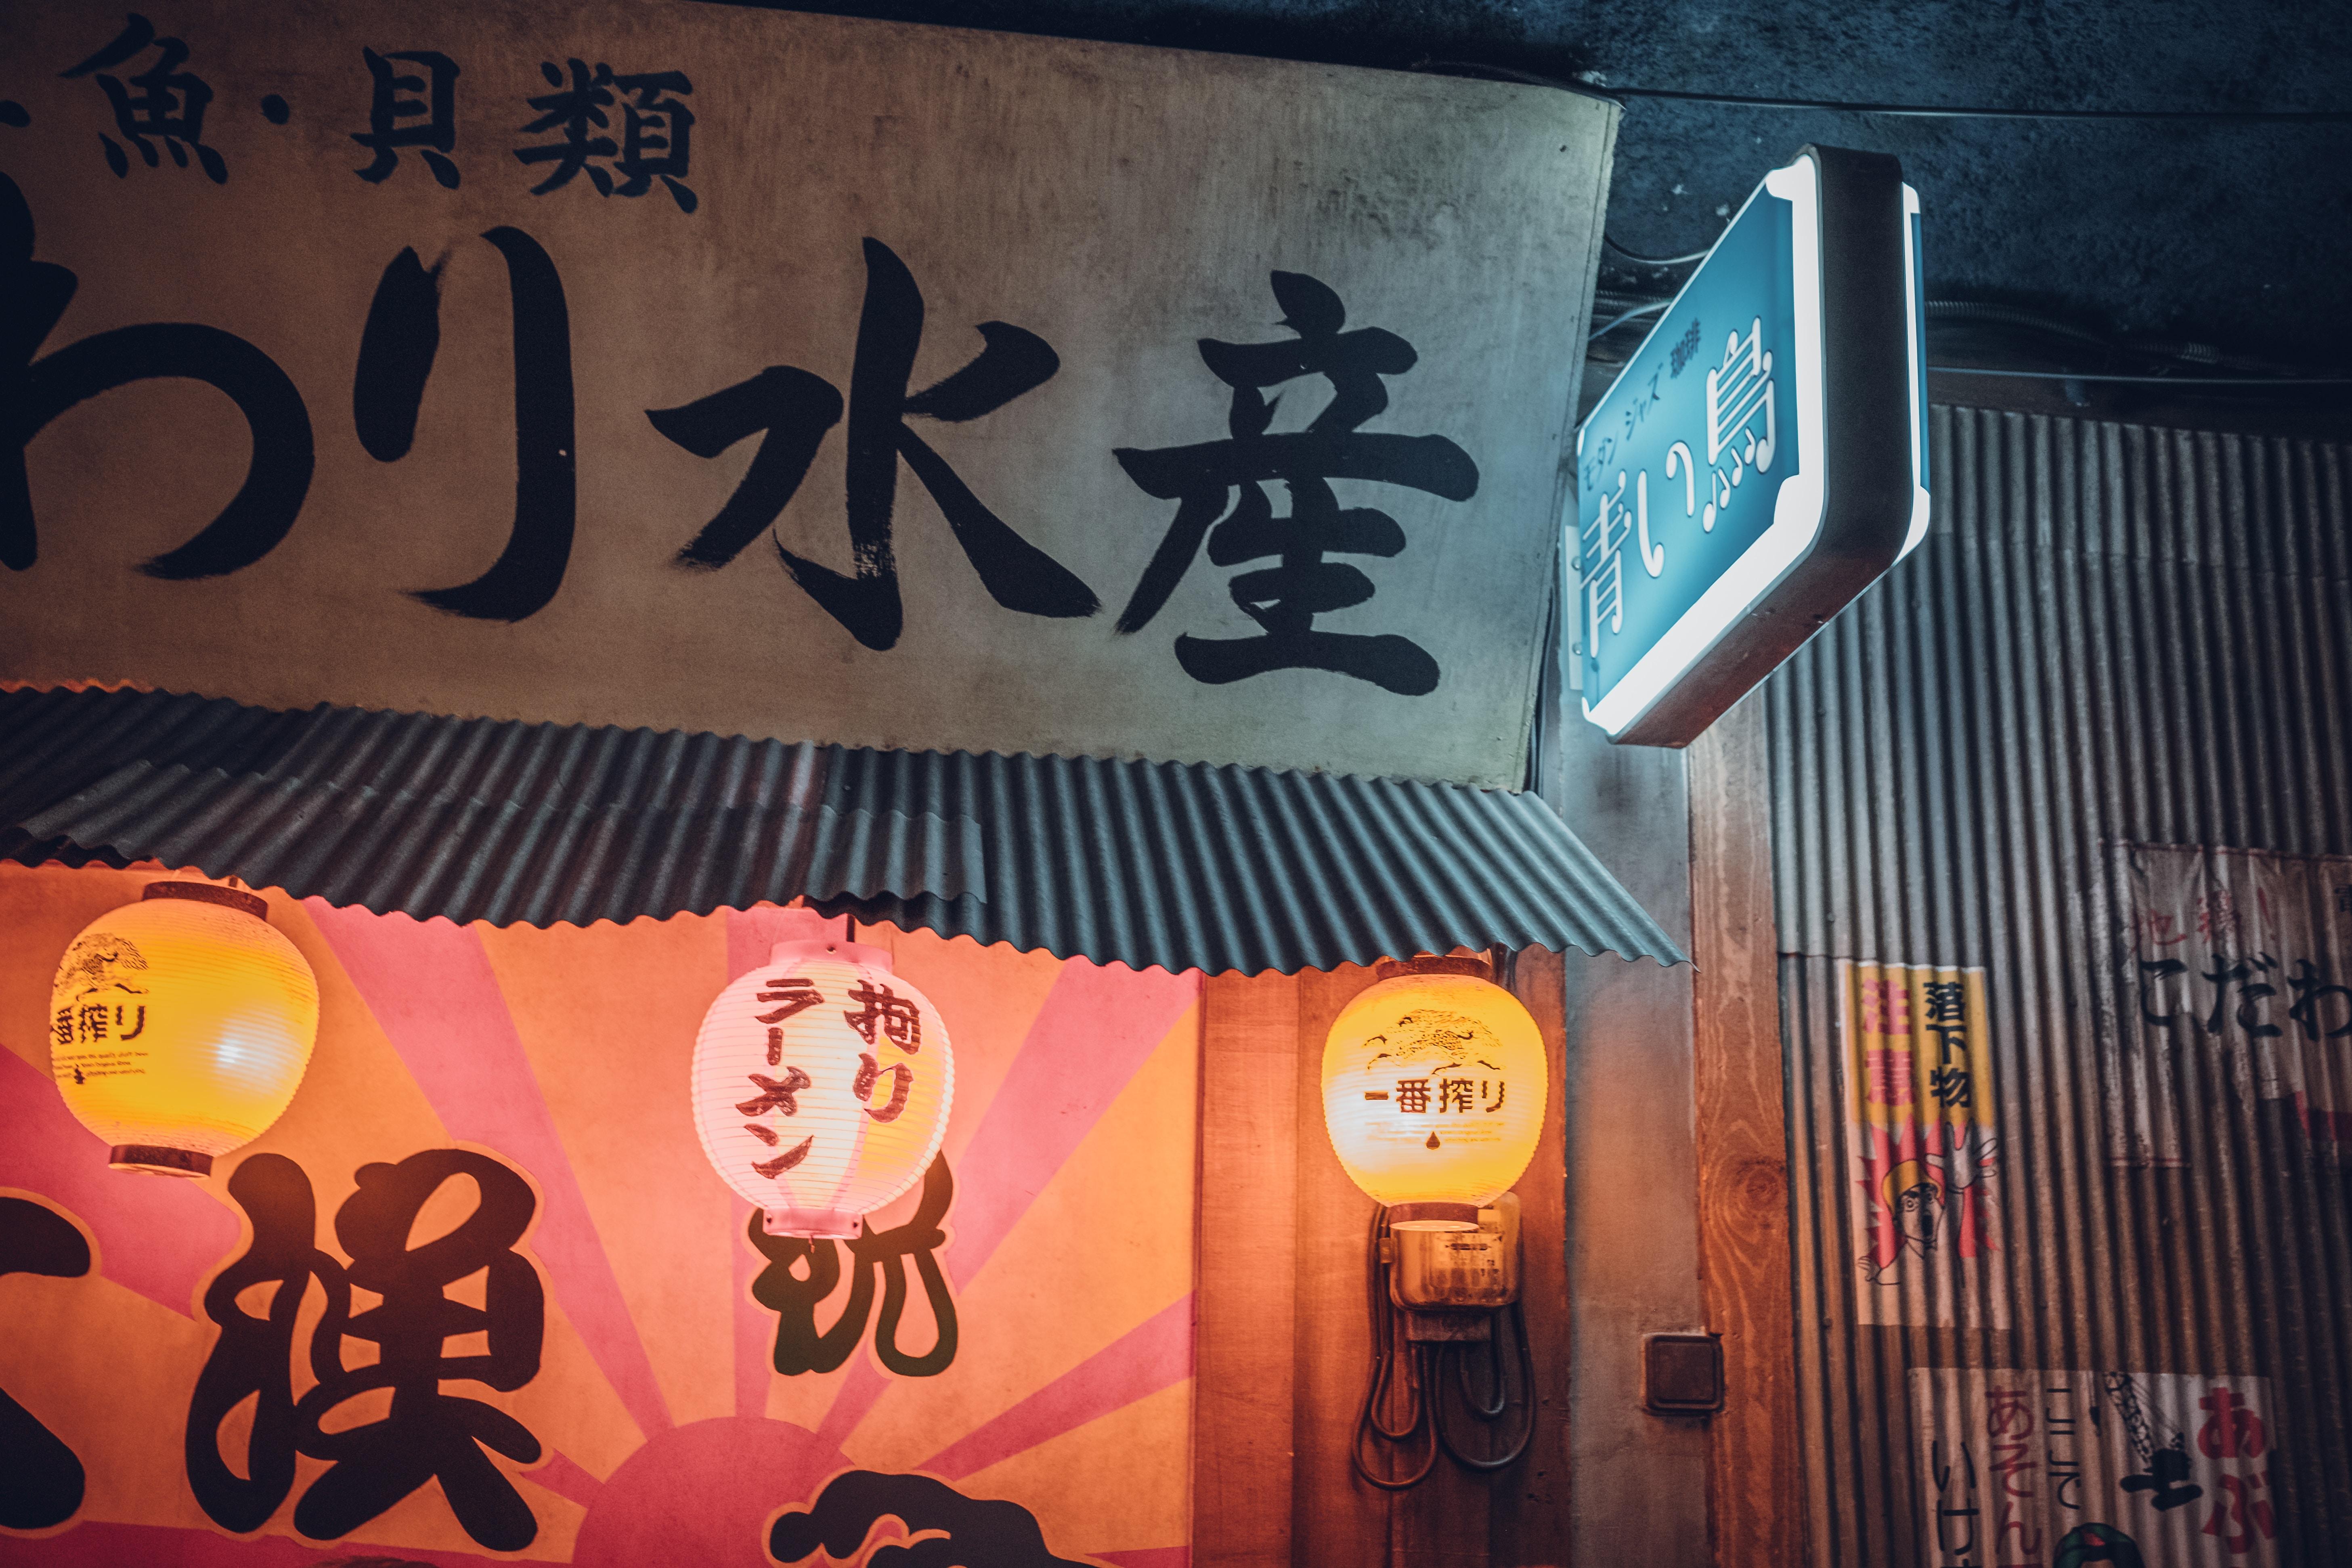 Japanese storefront with lanterns